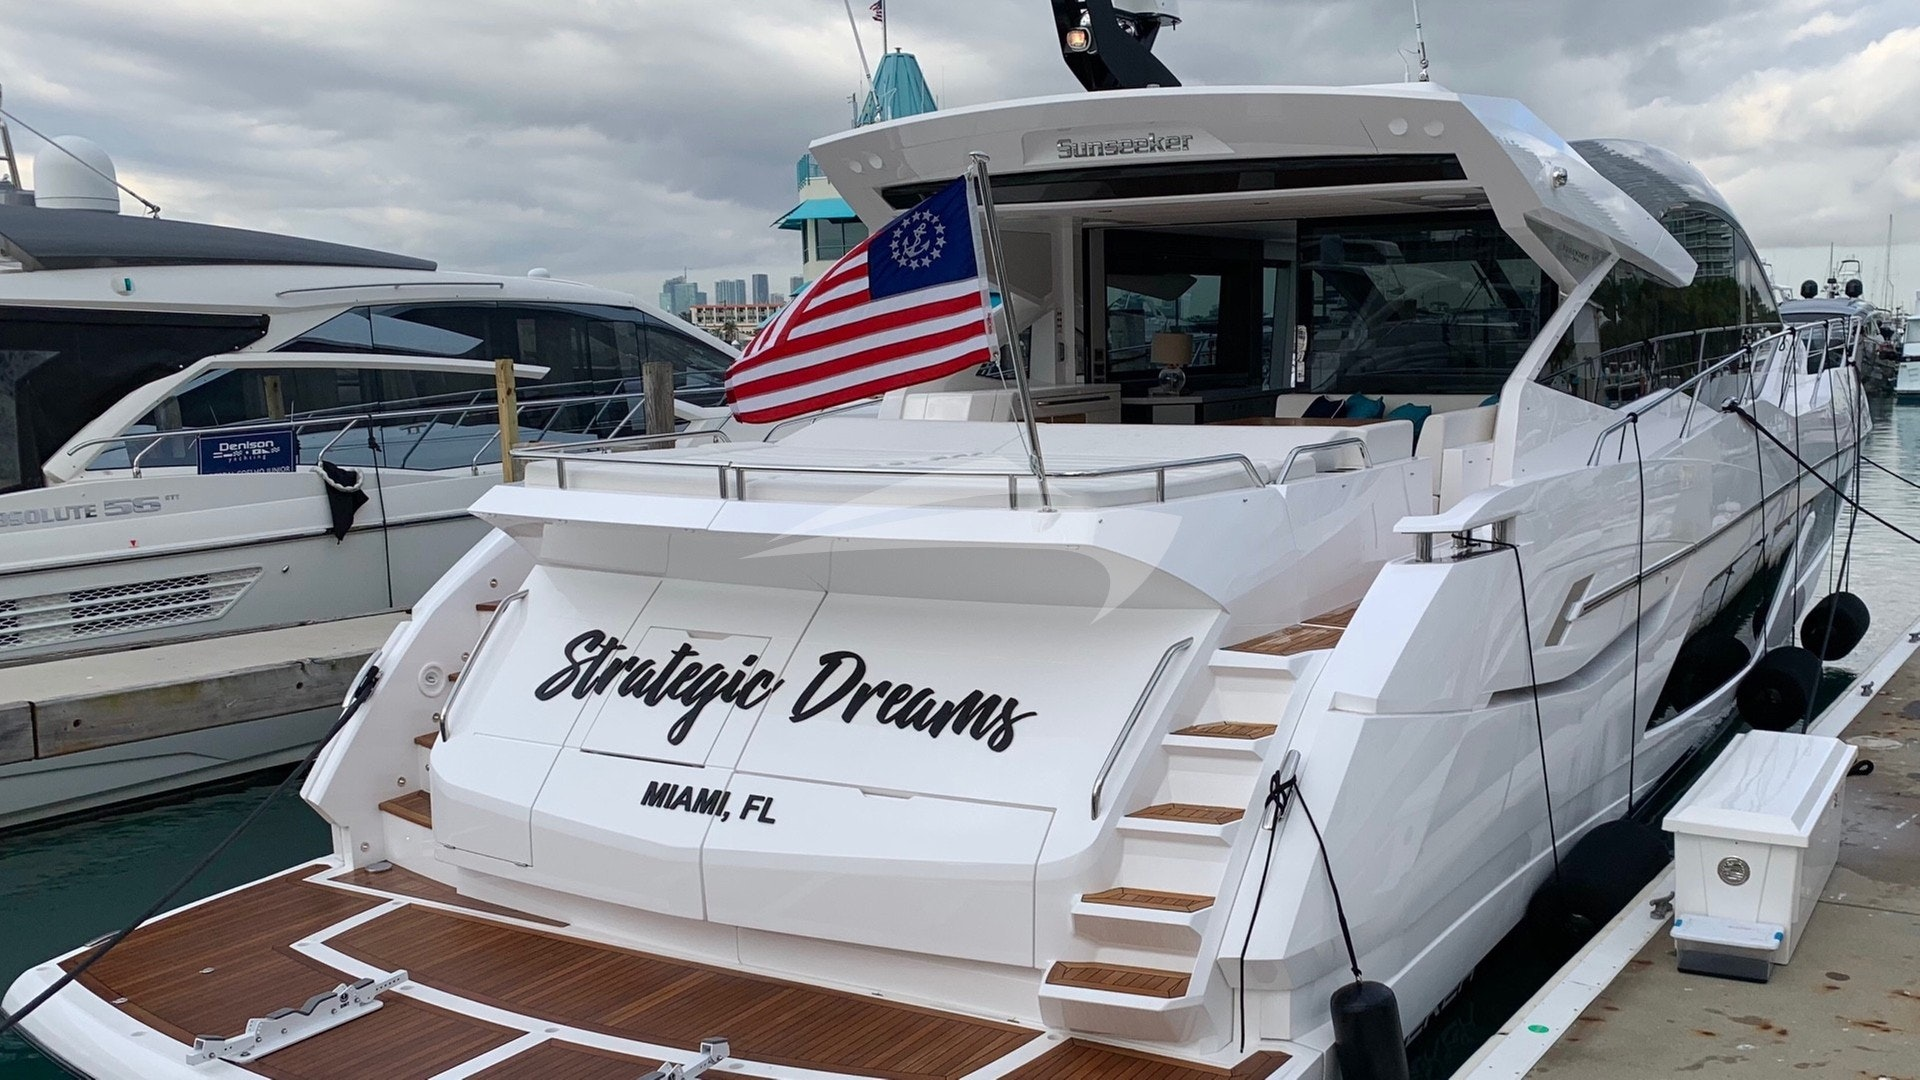 Strategic dreams aft deck/swim platform